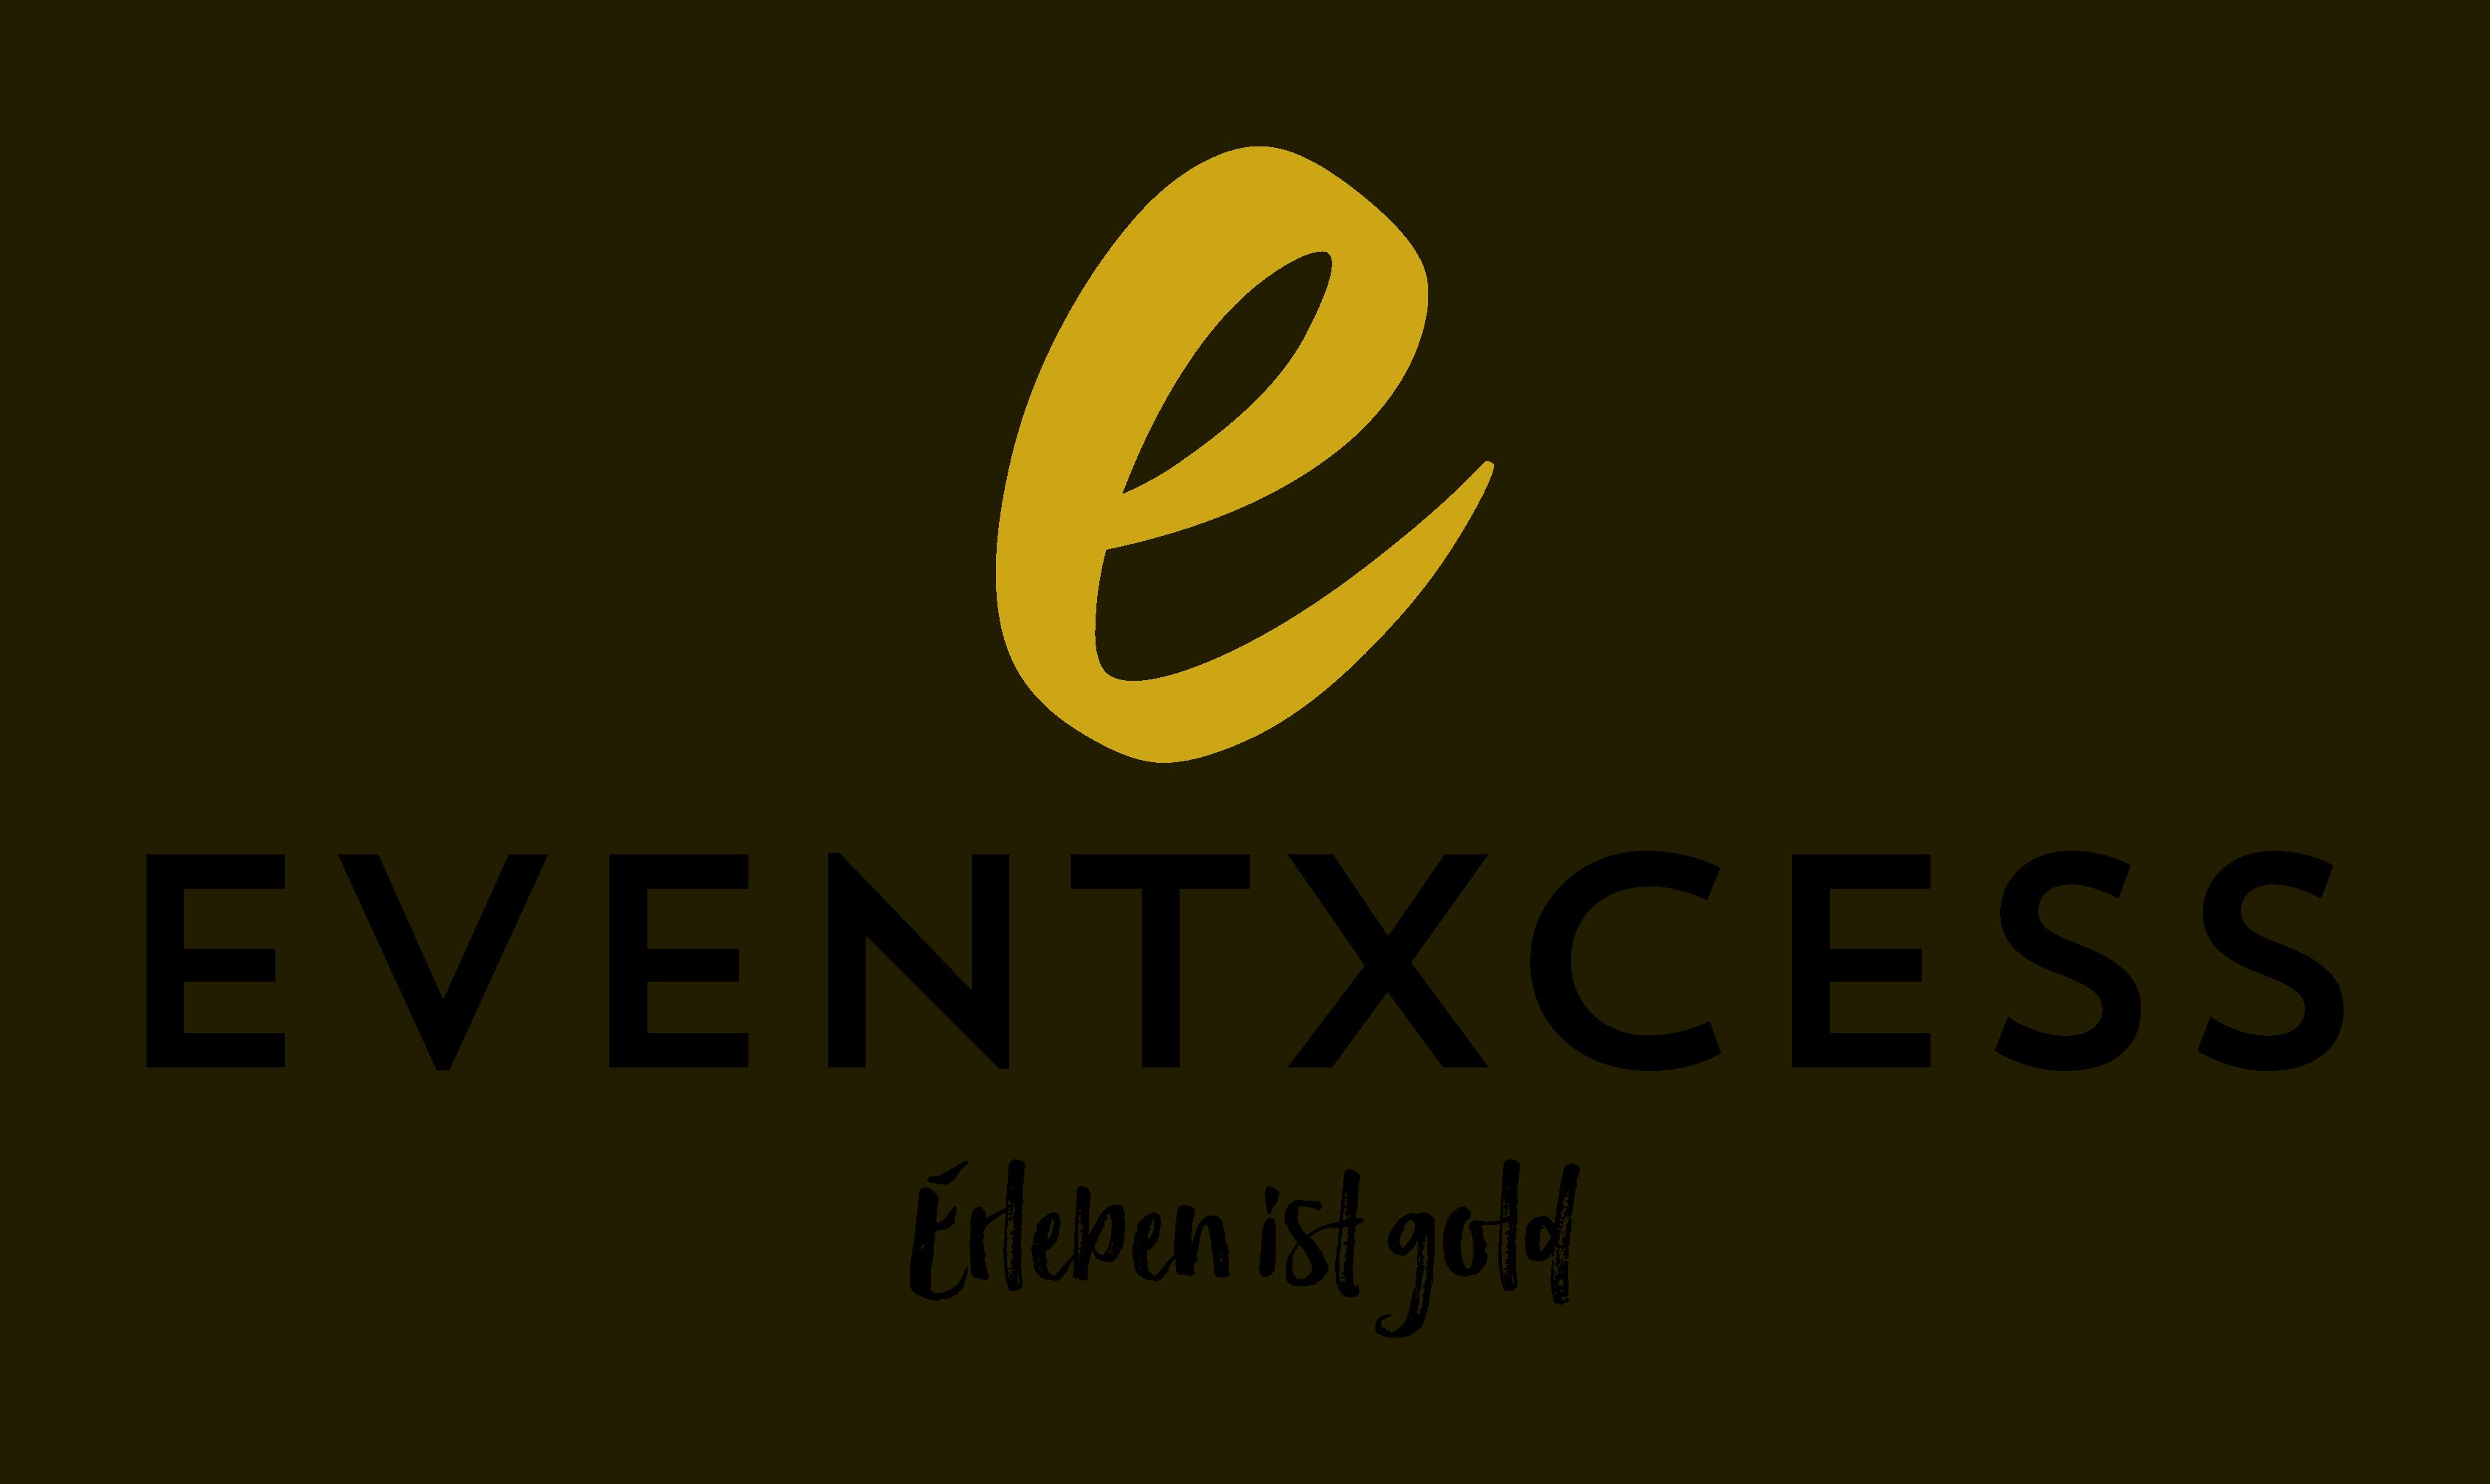 Eventxcess